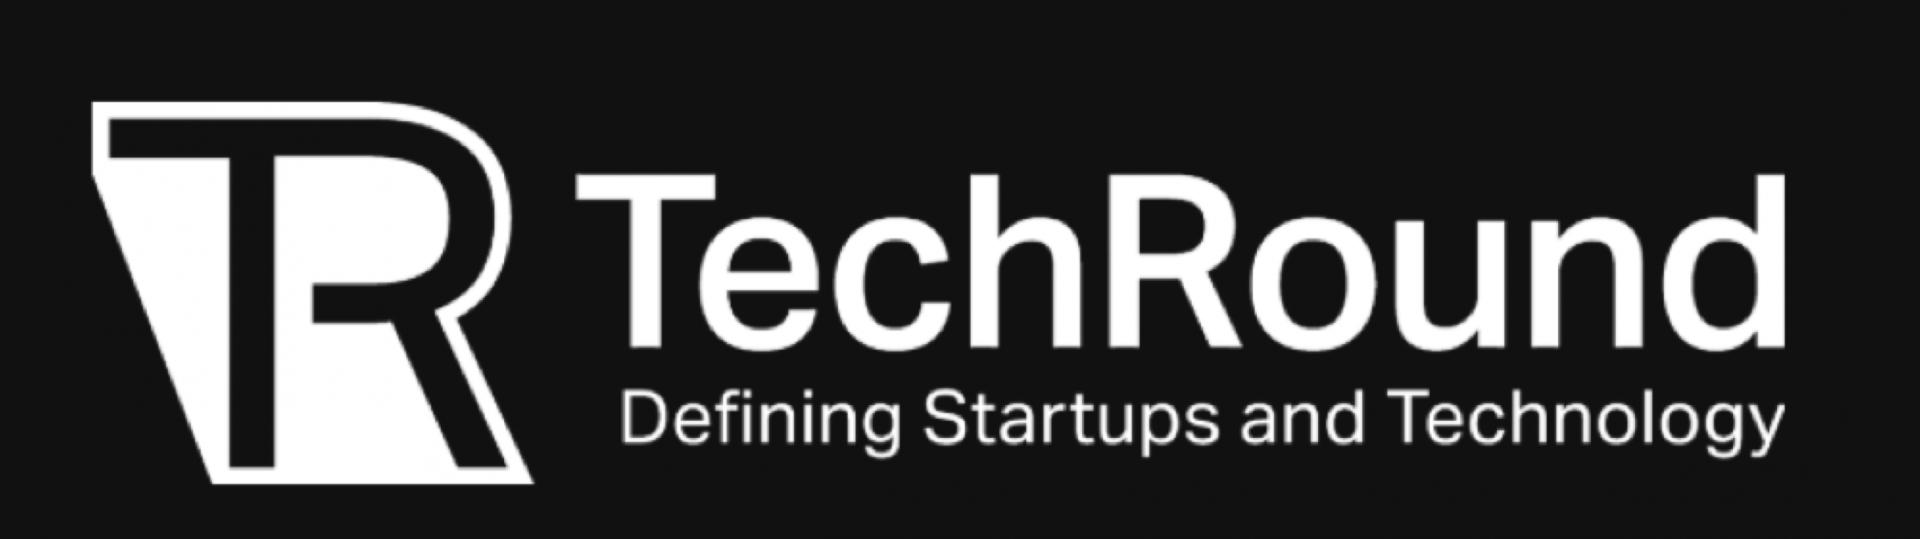 Feebris explores future of Remote Monitoring with TechRound